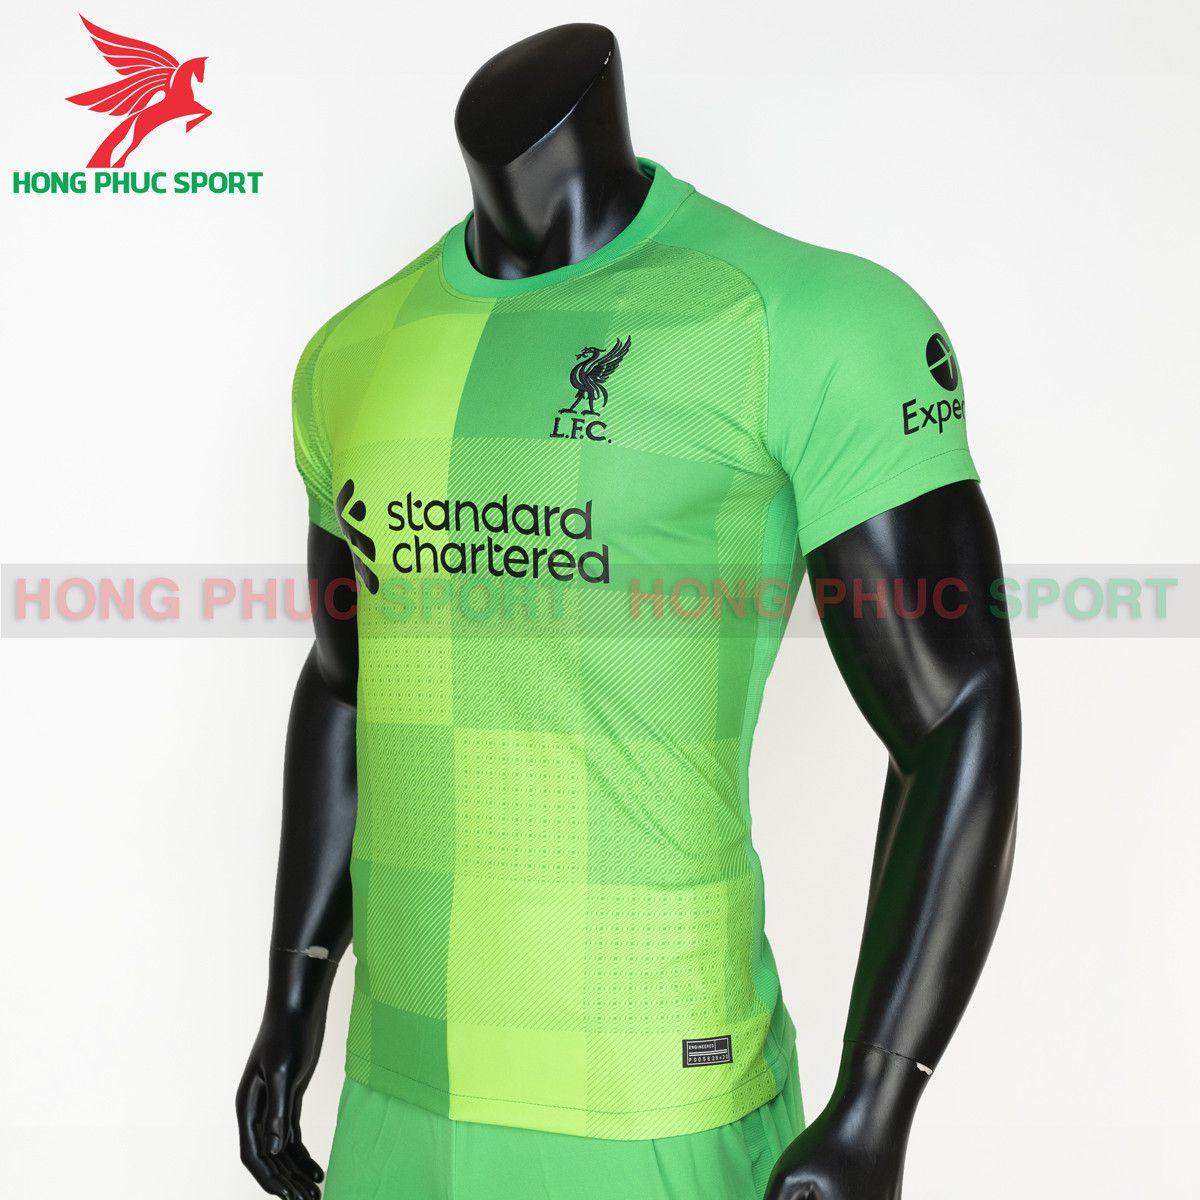 https://cdn.hongphucsport.com/unsafe/s4.shopbay.vn/files/285/ao-thu-mon-liverpool-2021-2022-thailand-3-61403123b3266.jpg